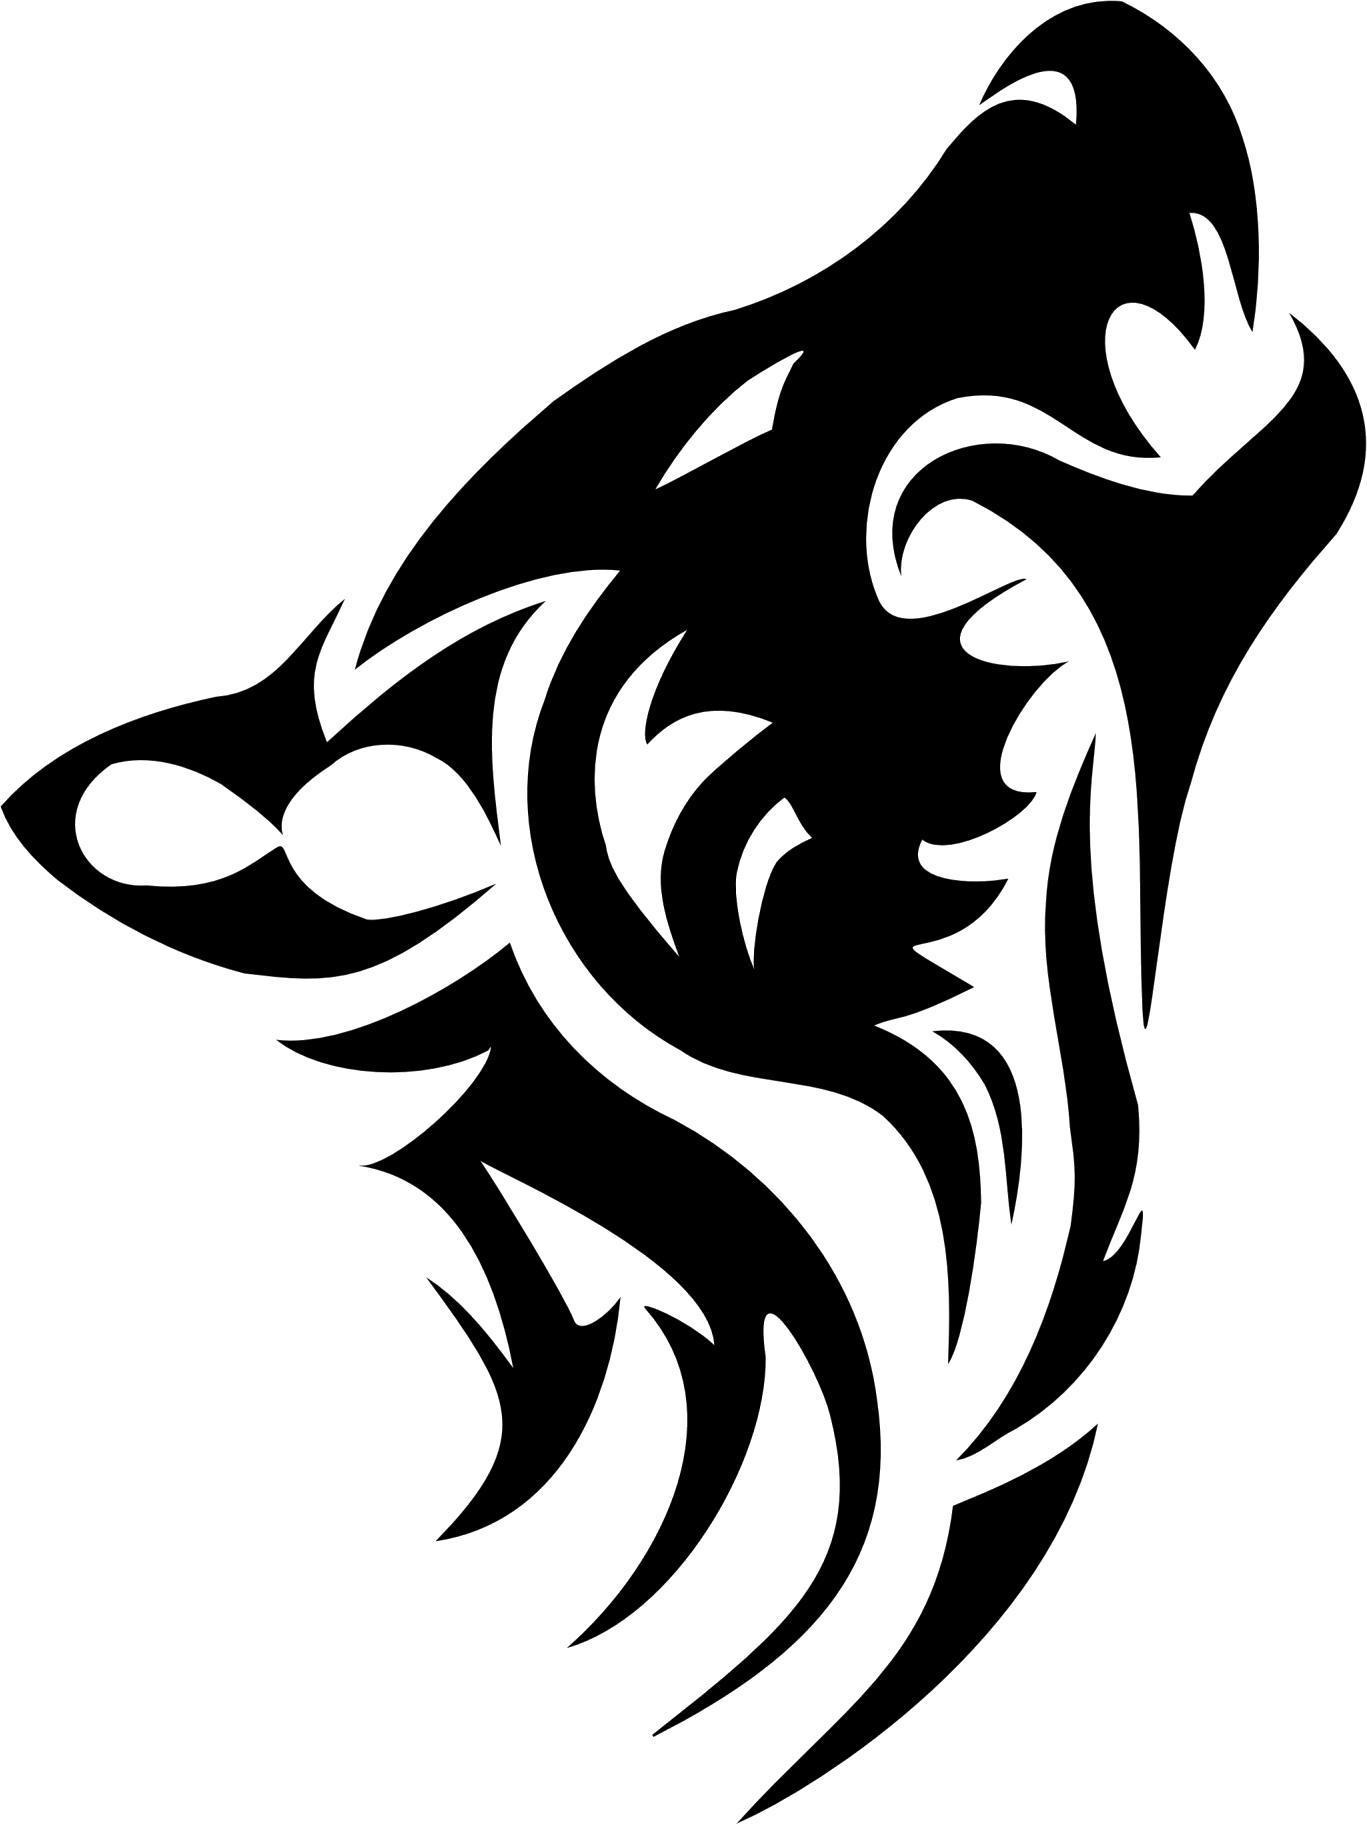 Tribal Tattoos PNG - 6802